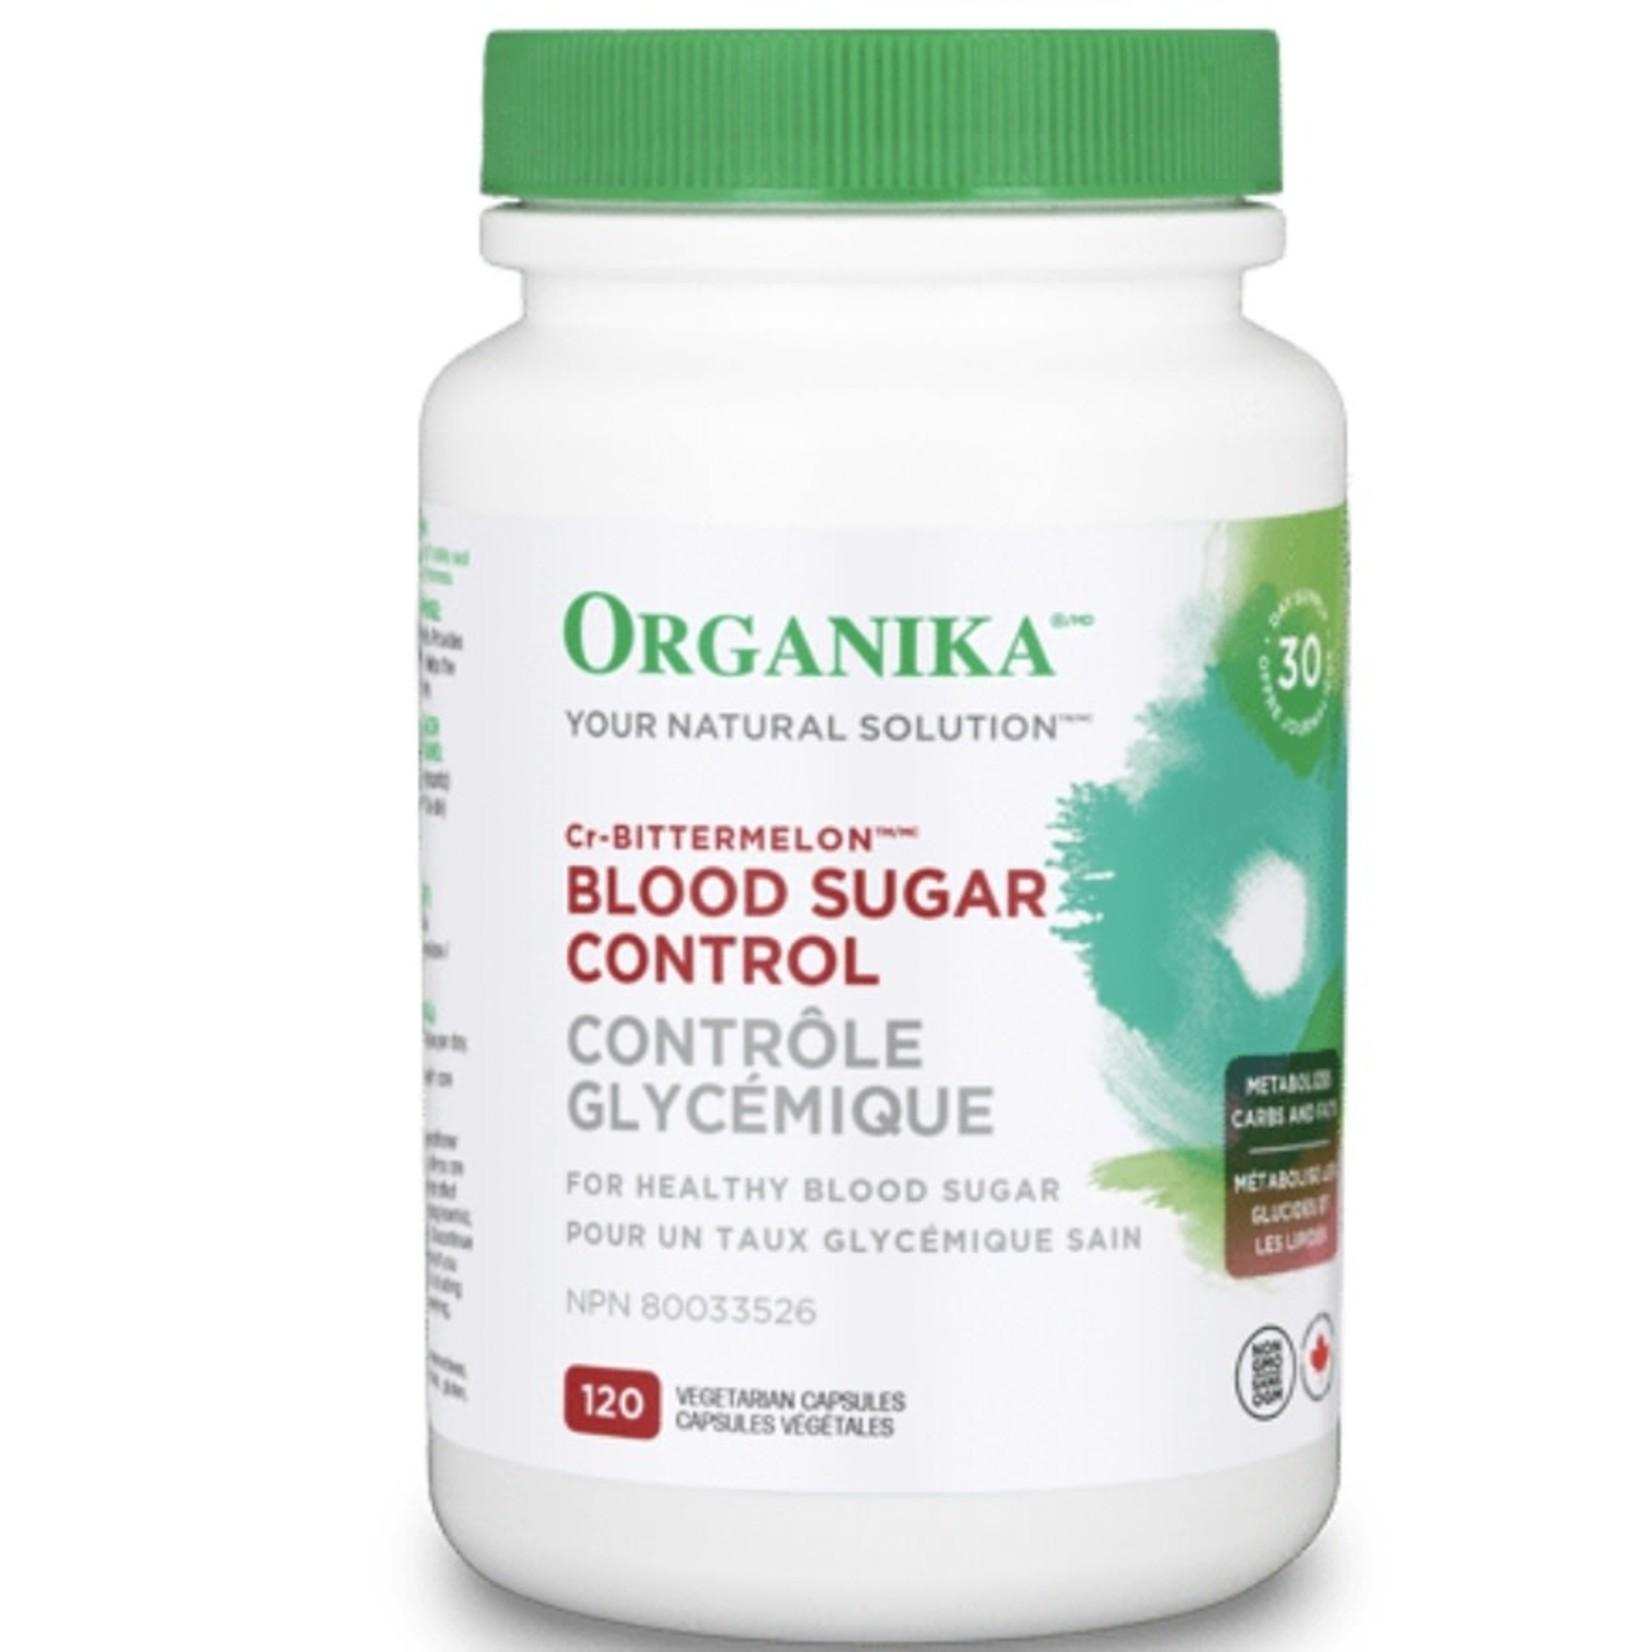 Organika Organika Blood Sugar Control 120 VCaps